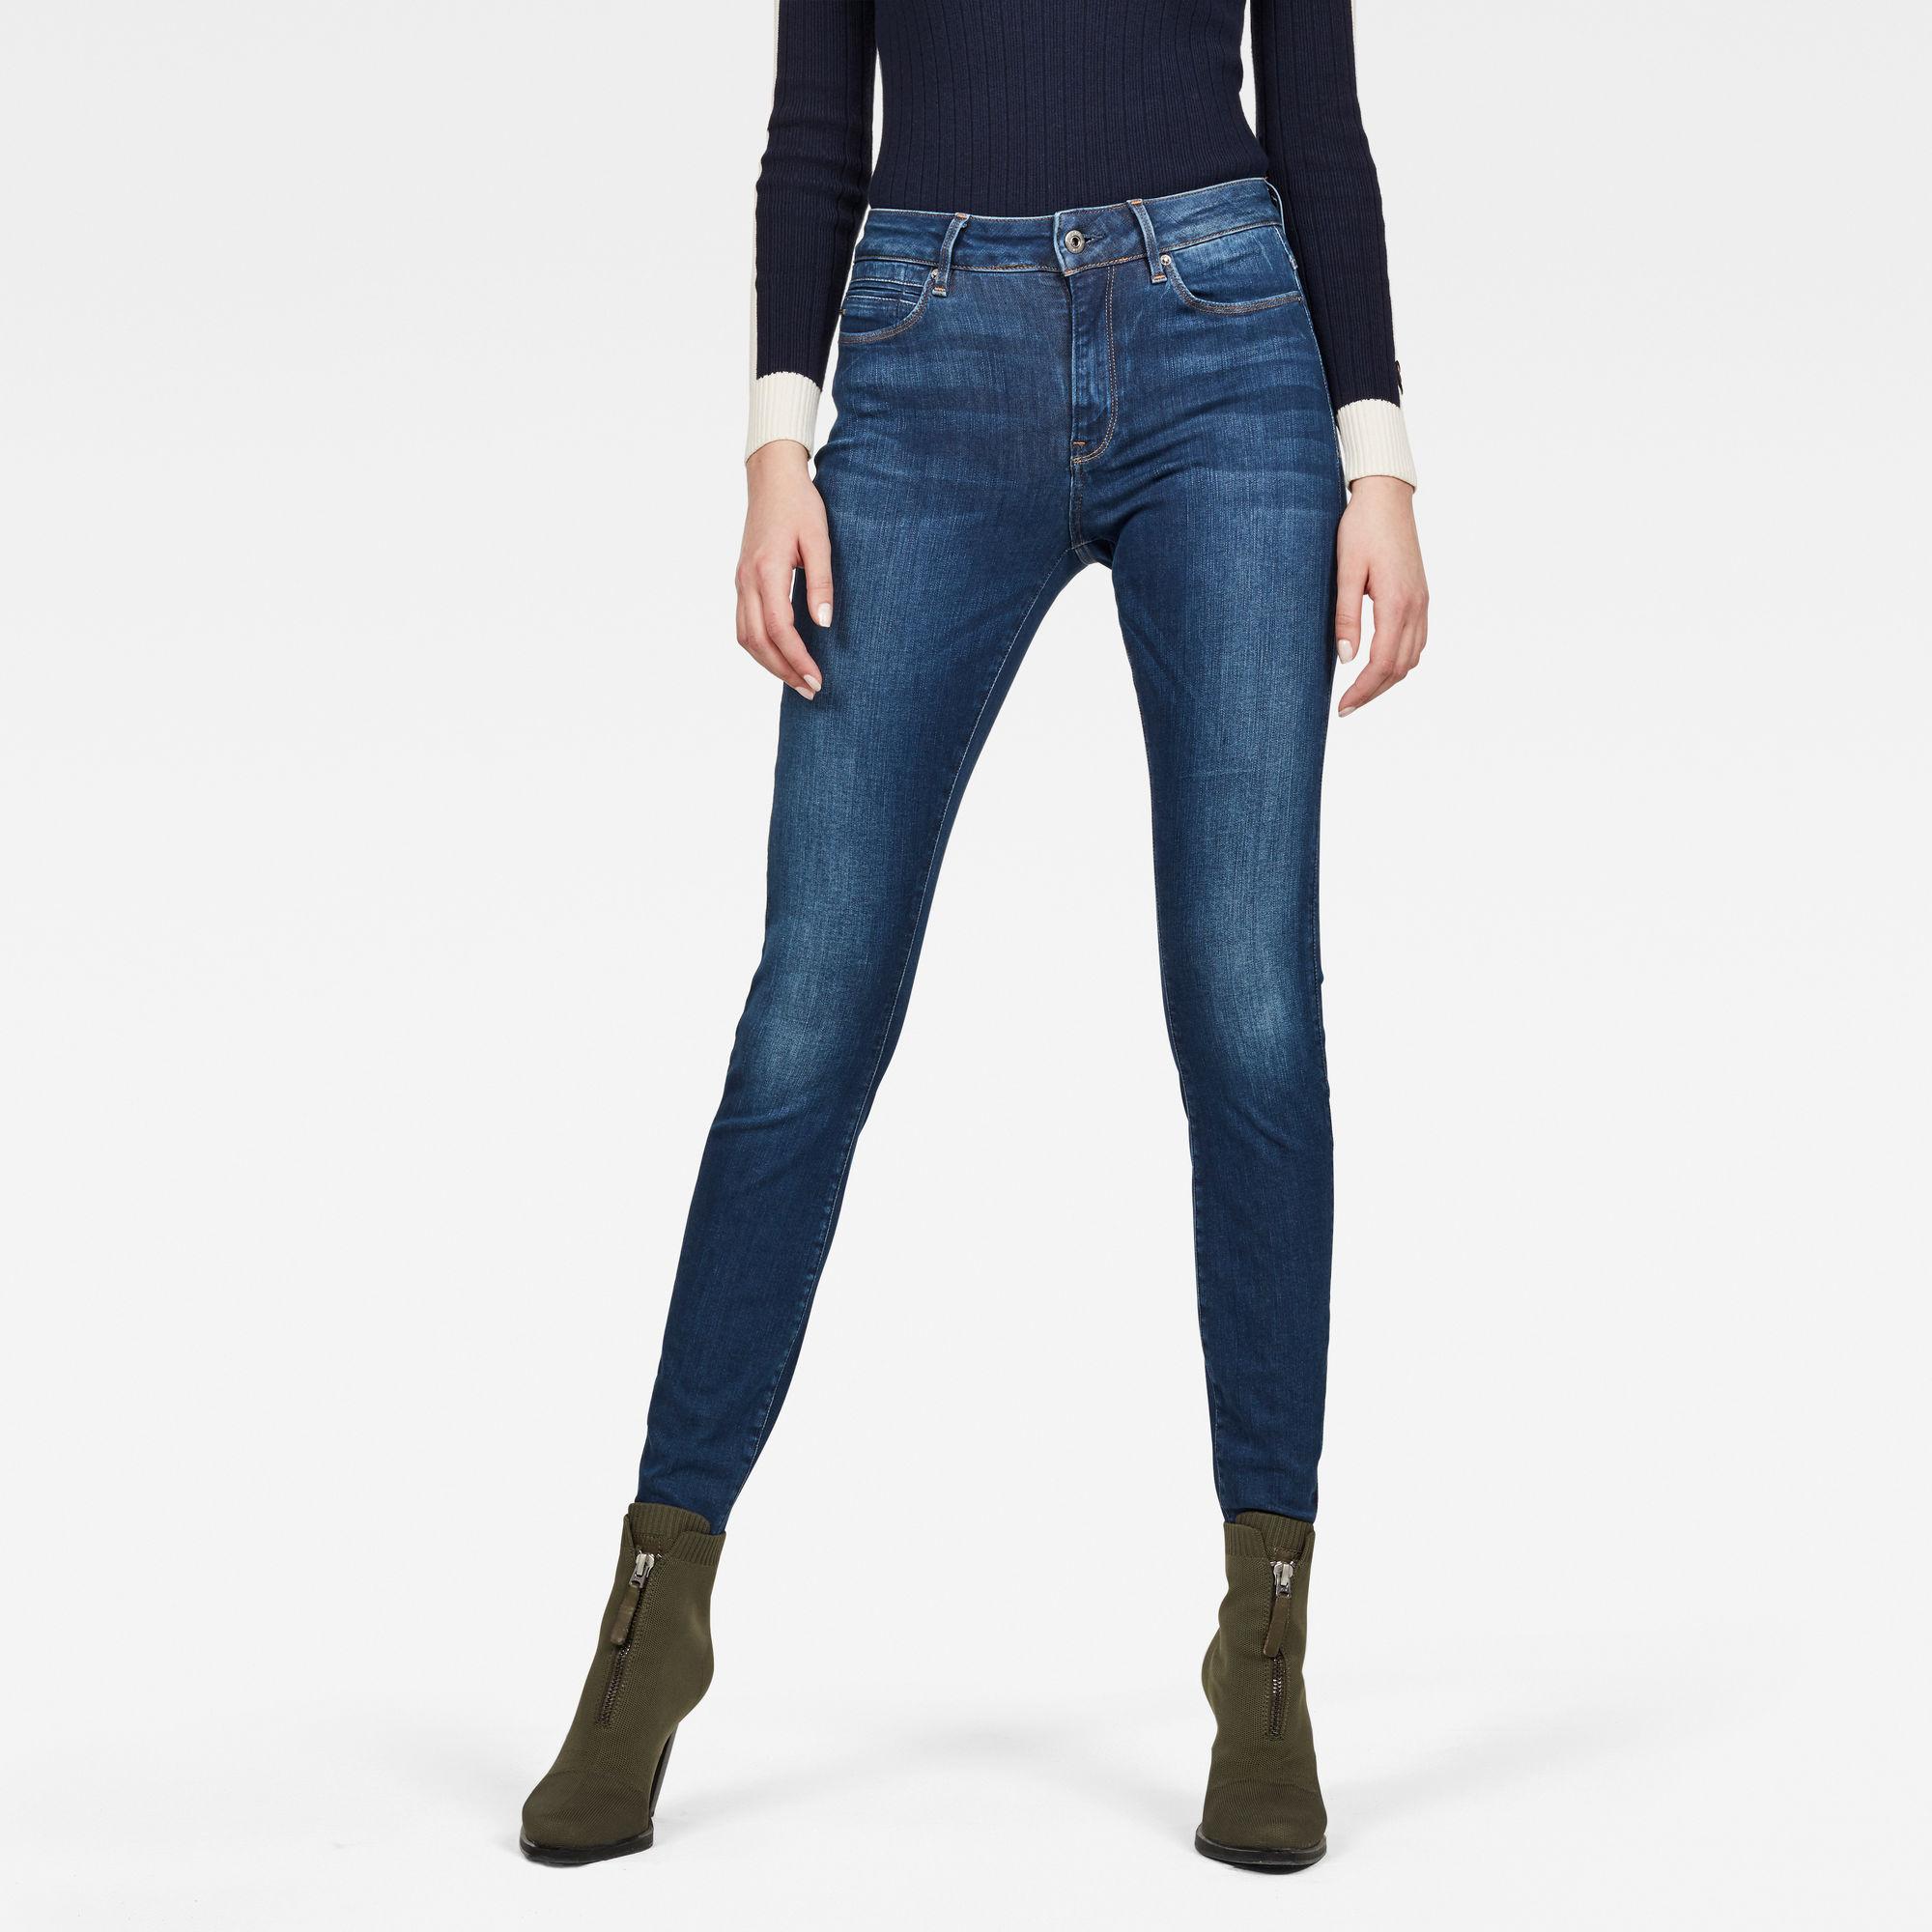 Van G Star Raw G-Star Shape High Waist Super Skinny Jeans Prijsvergelijk nu!